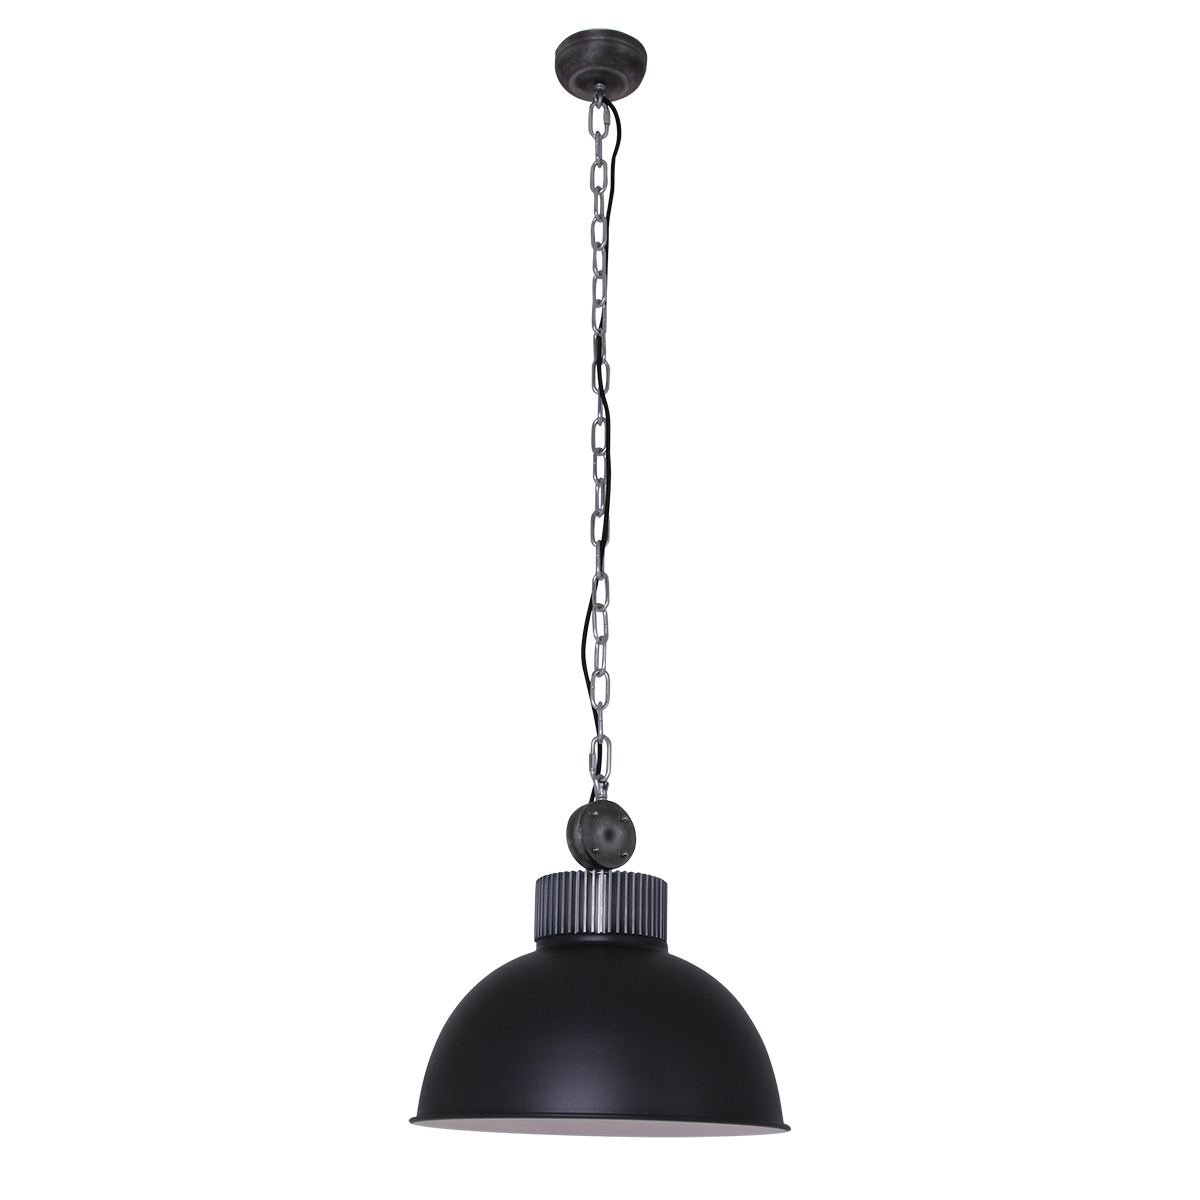 Industriele hanglamp 1-lichts E27 MEXLITE - 1455ZW - Industrie Hanglamp - Mexlite - Industrie lamp - Industrieel - Stoer- Zwart  - Metaal